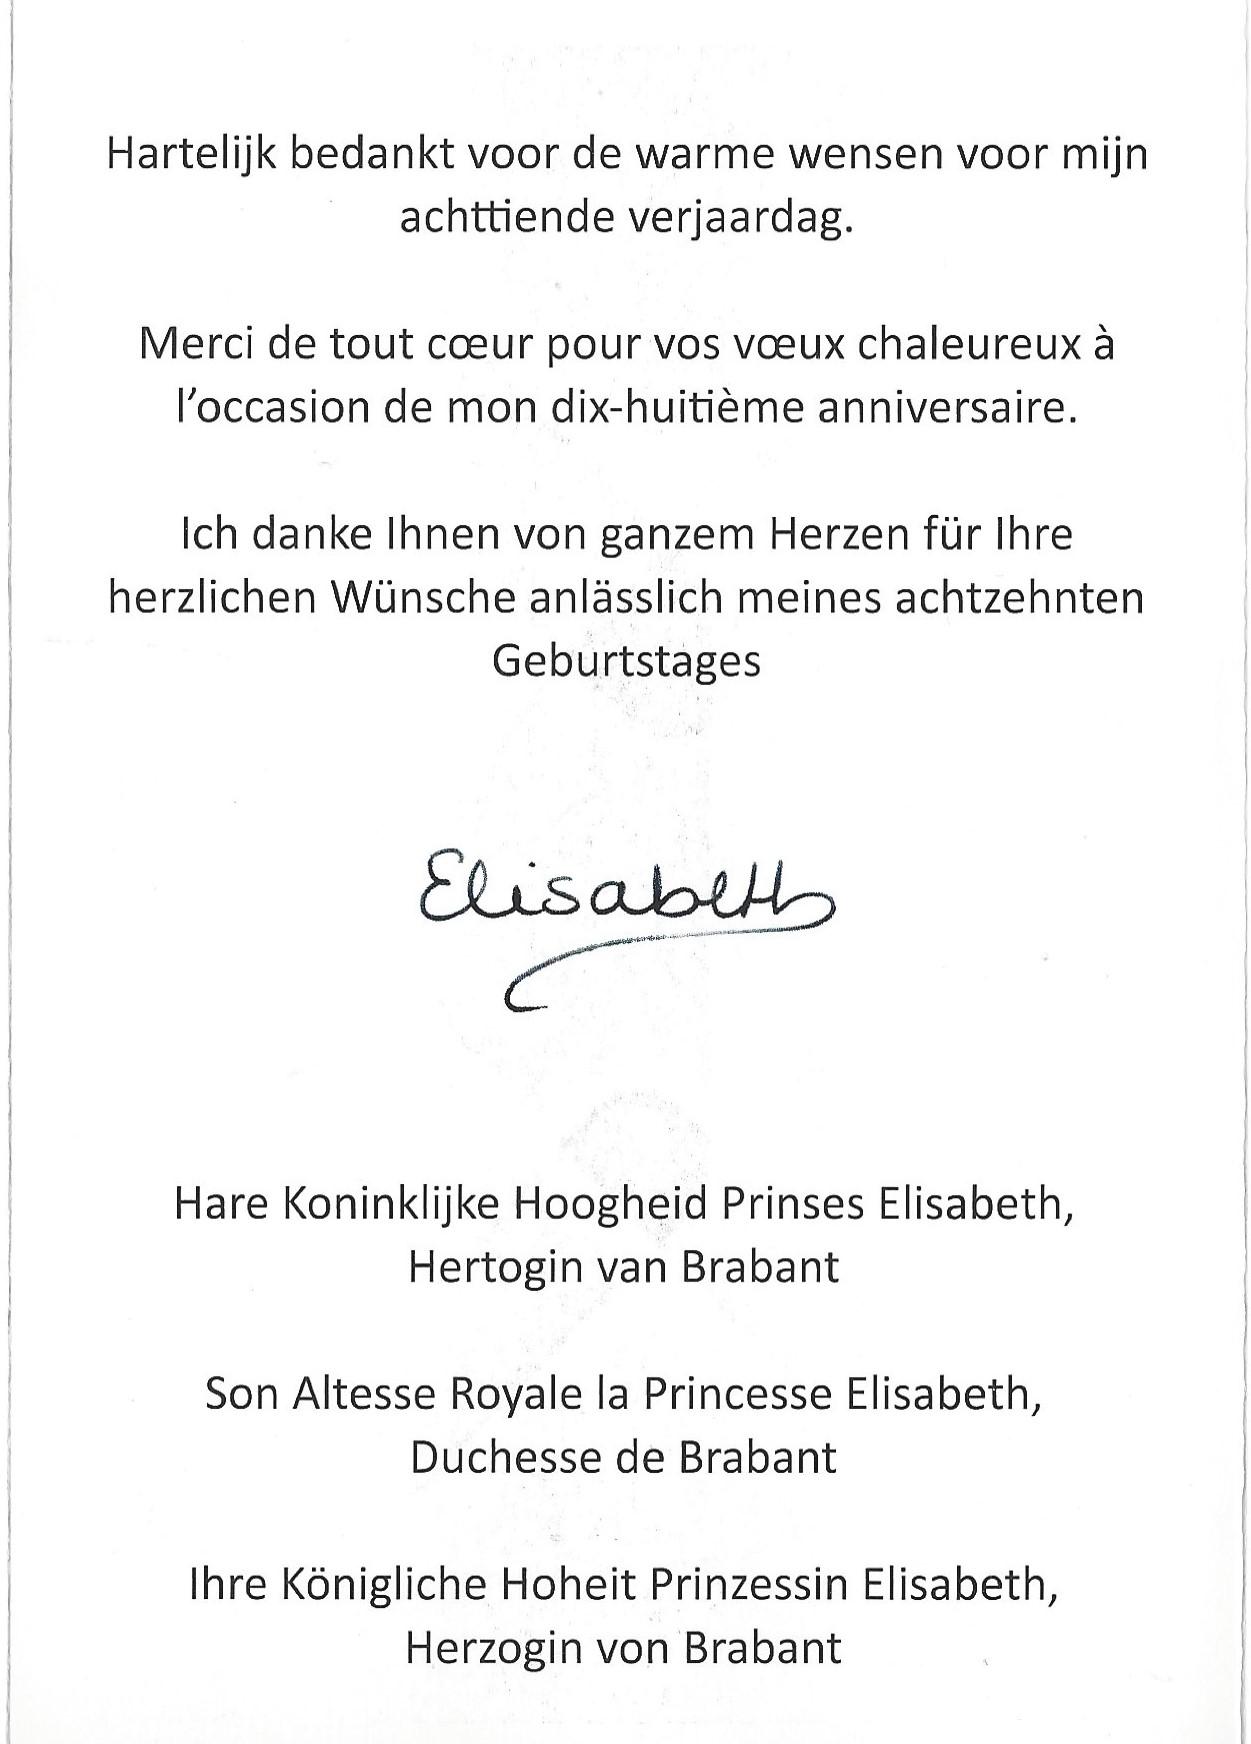 Duchess of Brabant Card Message